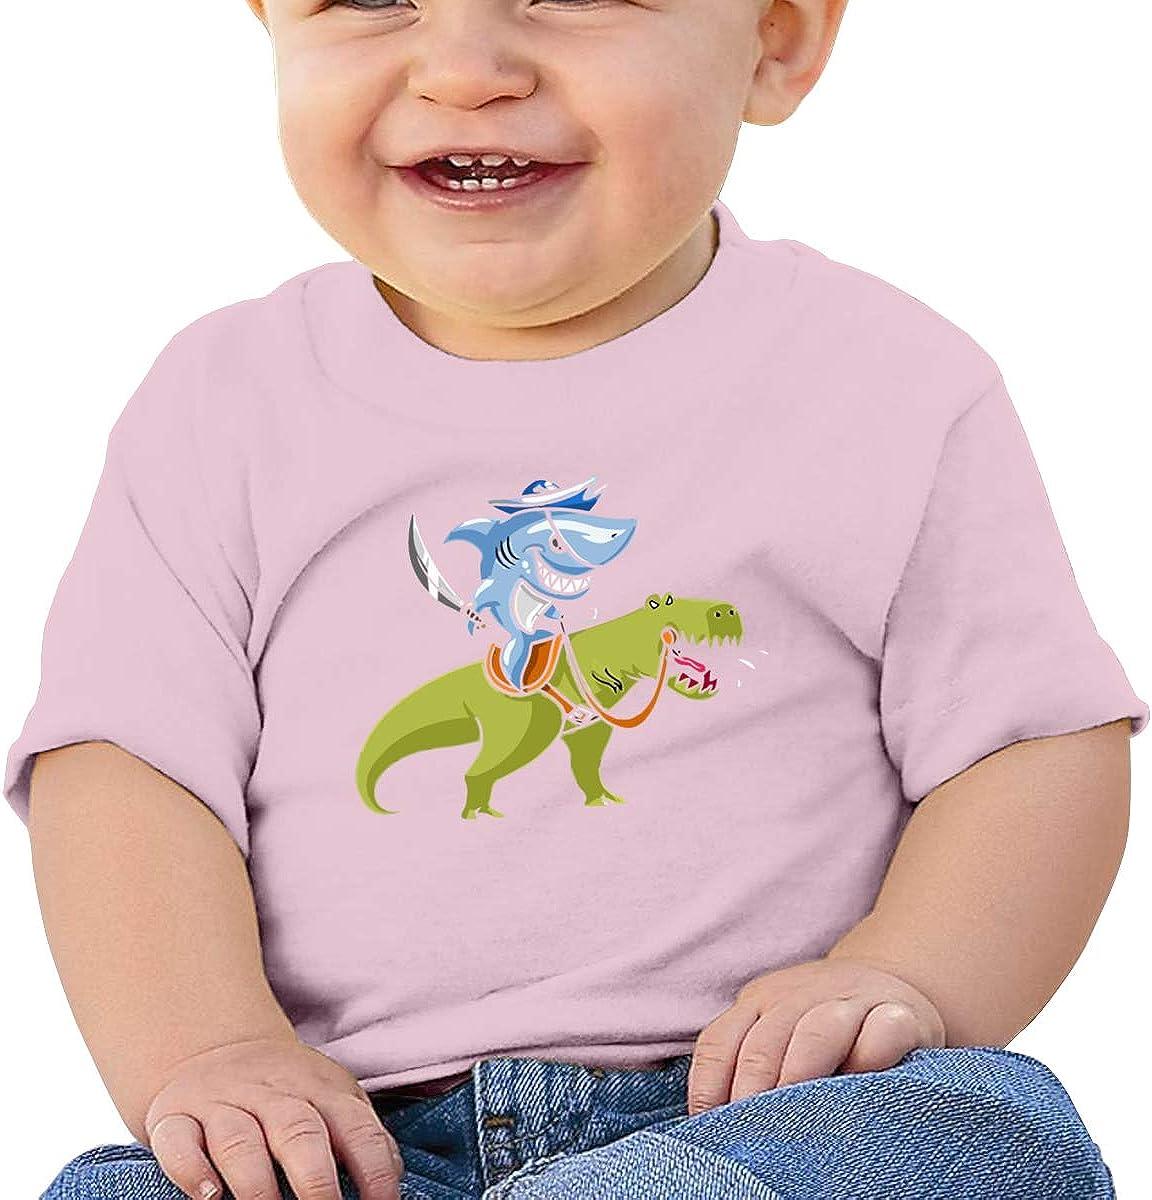 Negi Brazil Jiu-Jitsu Tshirts Cotton Baby Boy Short Sleeve